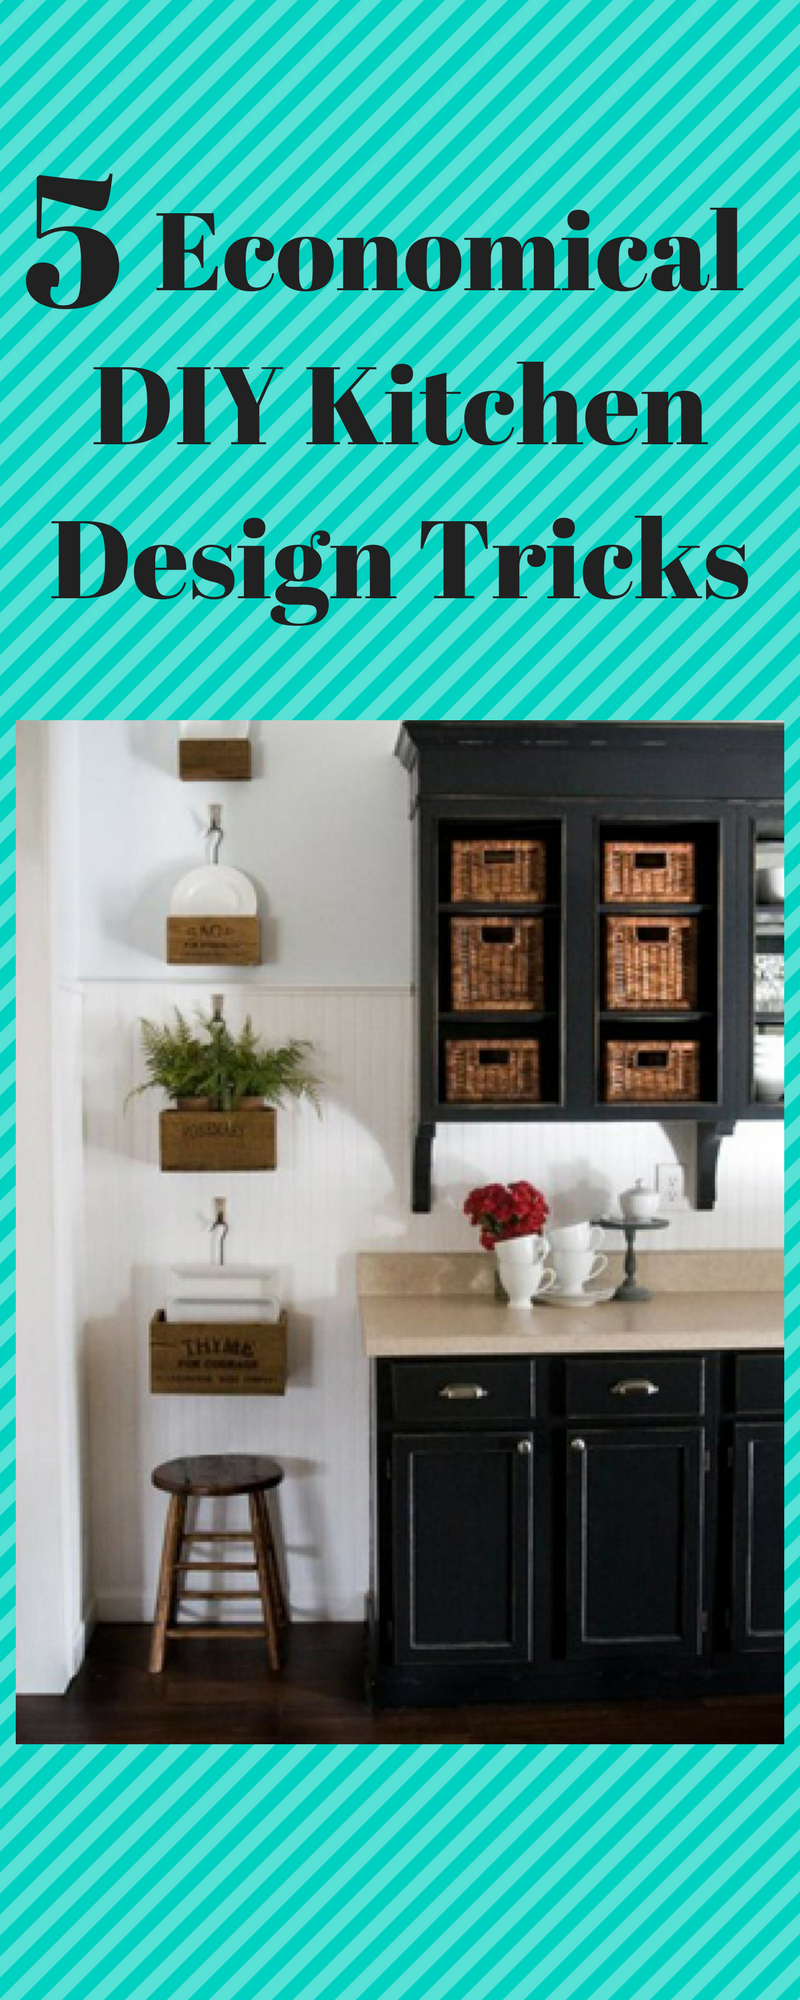 design kitchen italian%0A   Economical DIY Kitchen Design Tricks